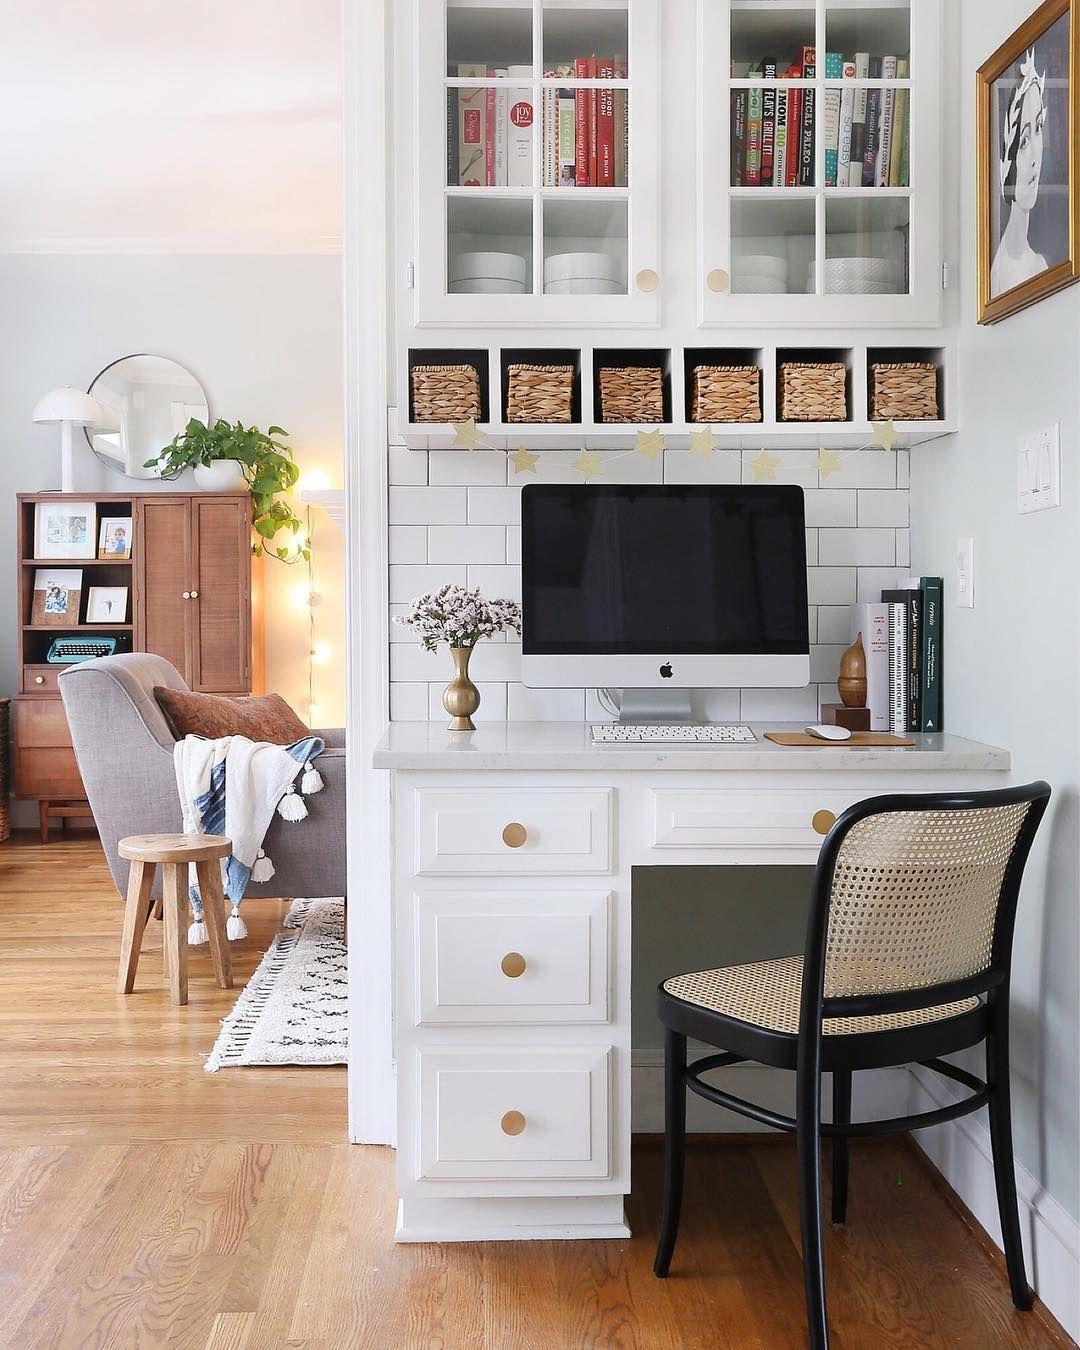 811 Black Side Chair Kitchen Office Nook Desk In Living Room Home Decor